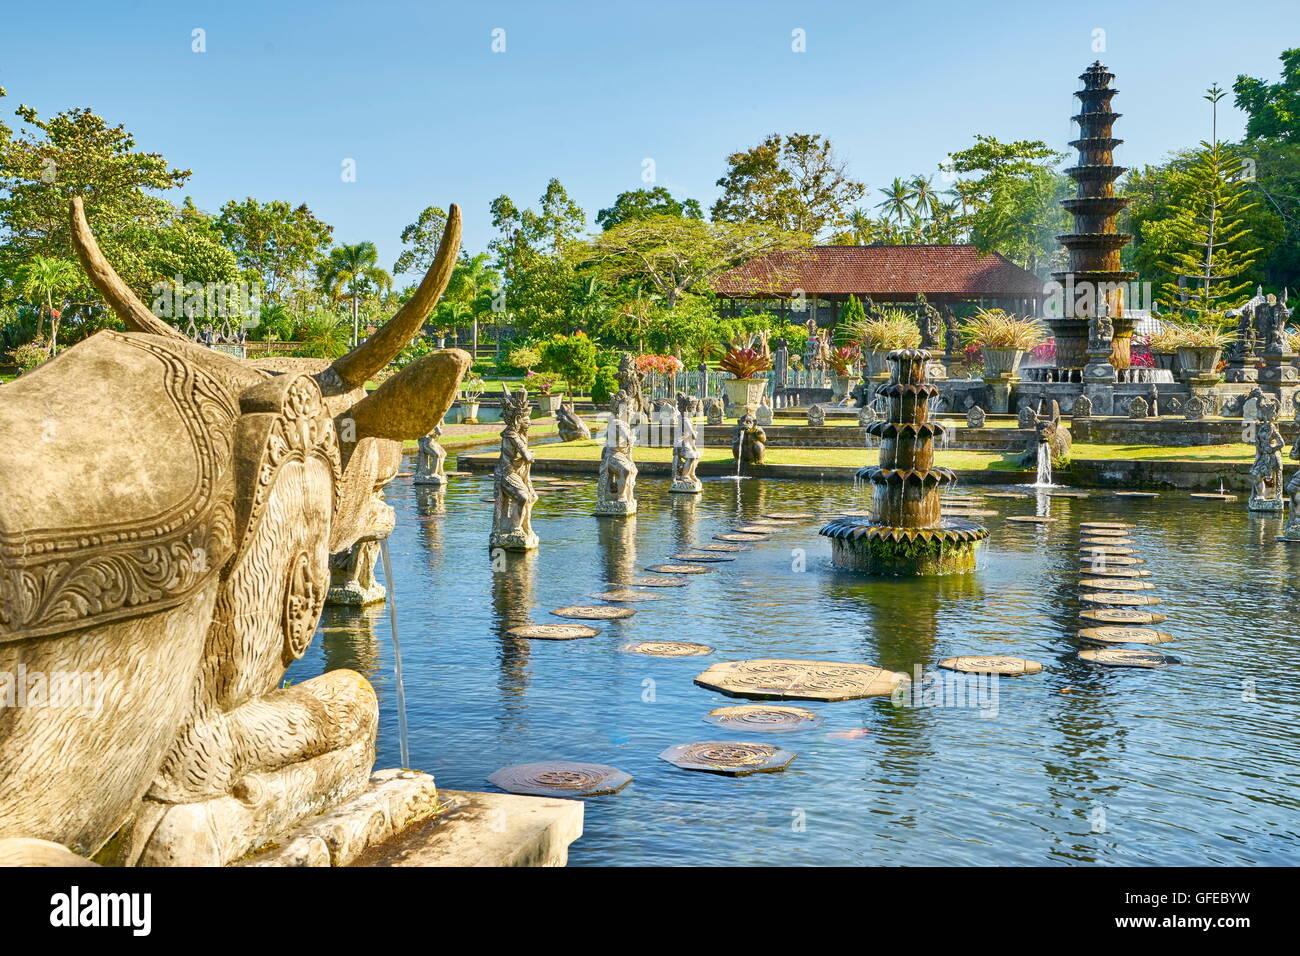 The Water Palace Tirta Gangga, Bali, Indonesia - Stock Image